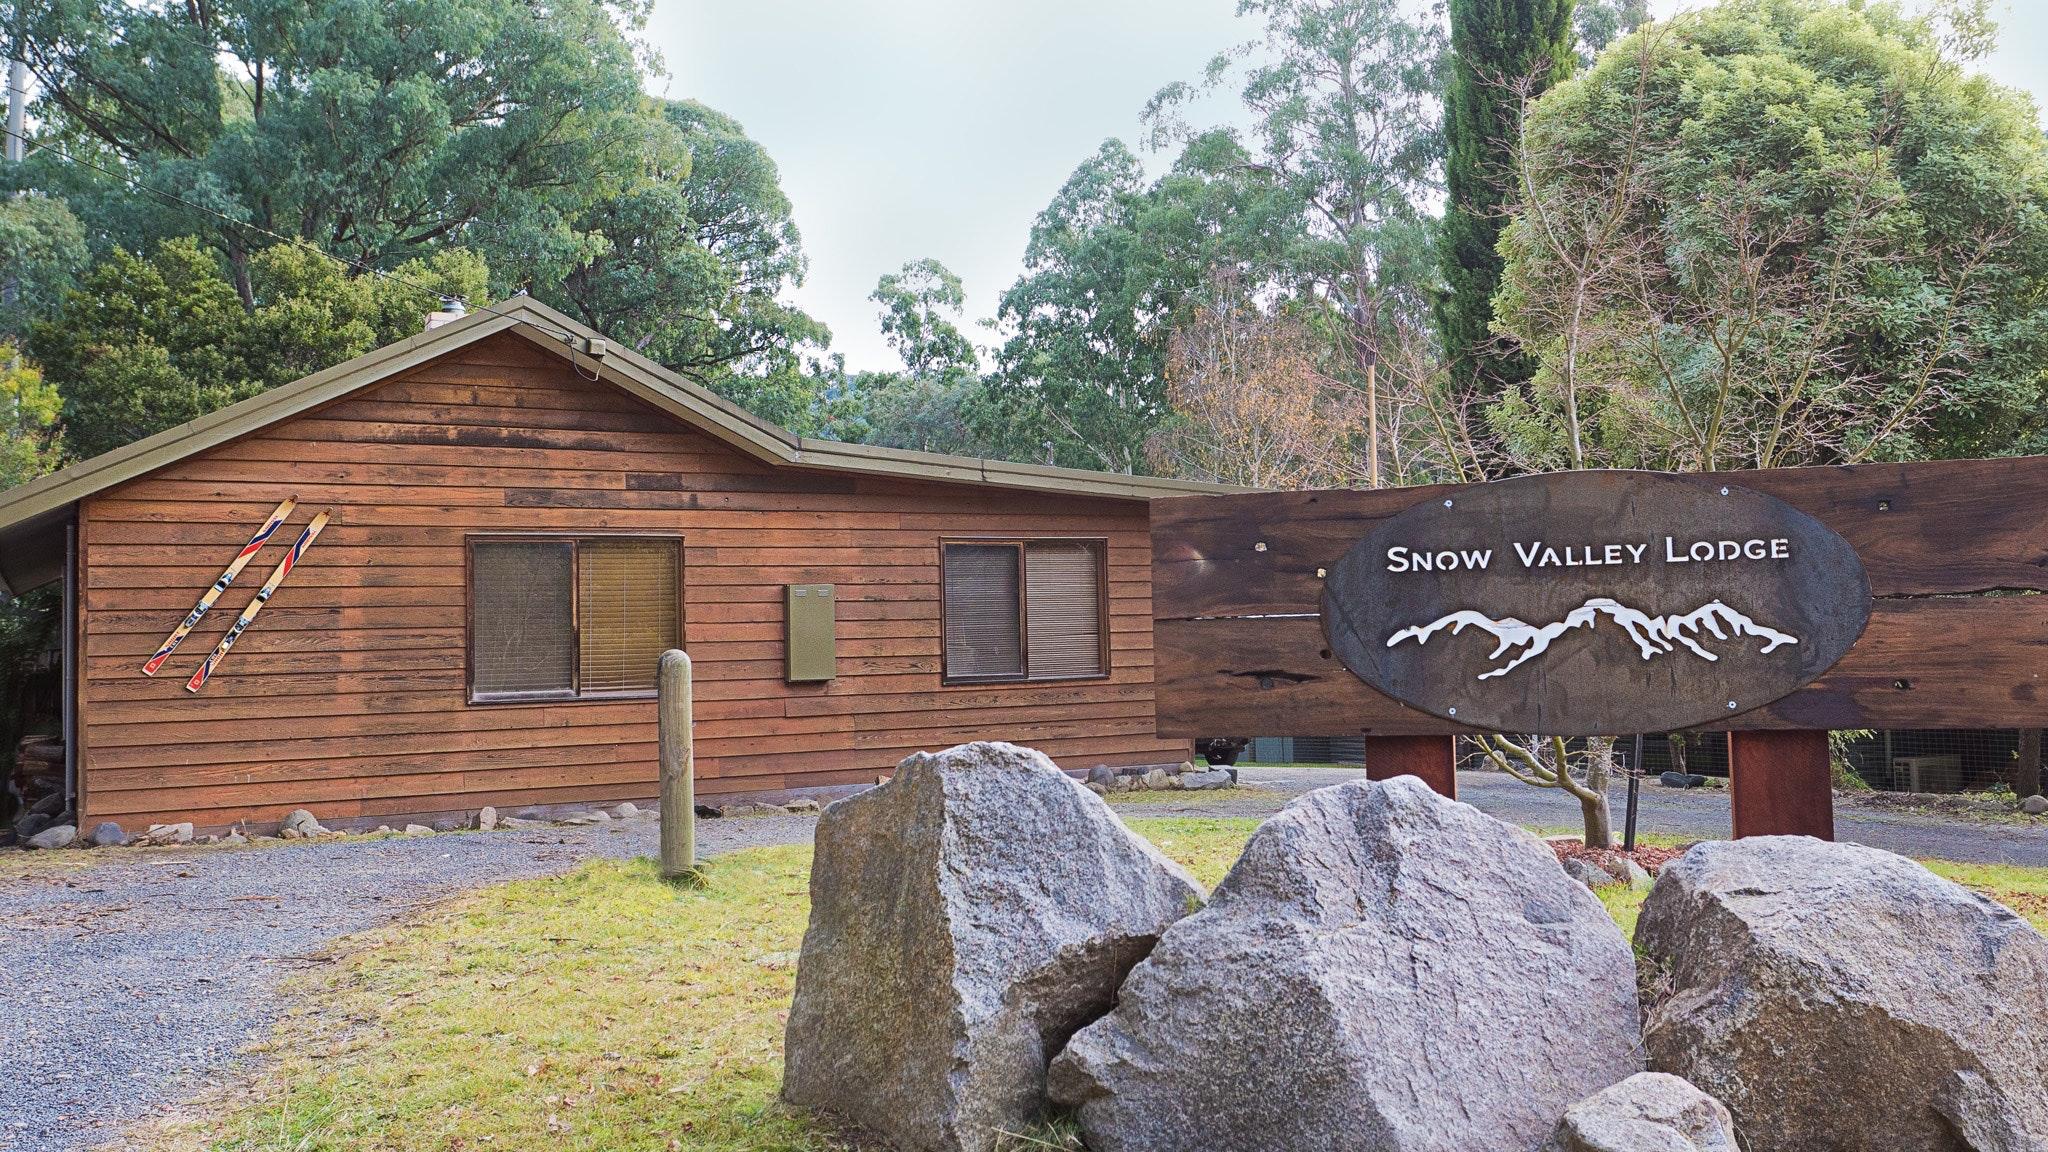 Snow Valley Lodge